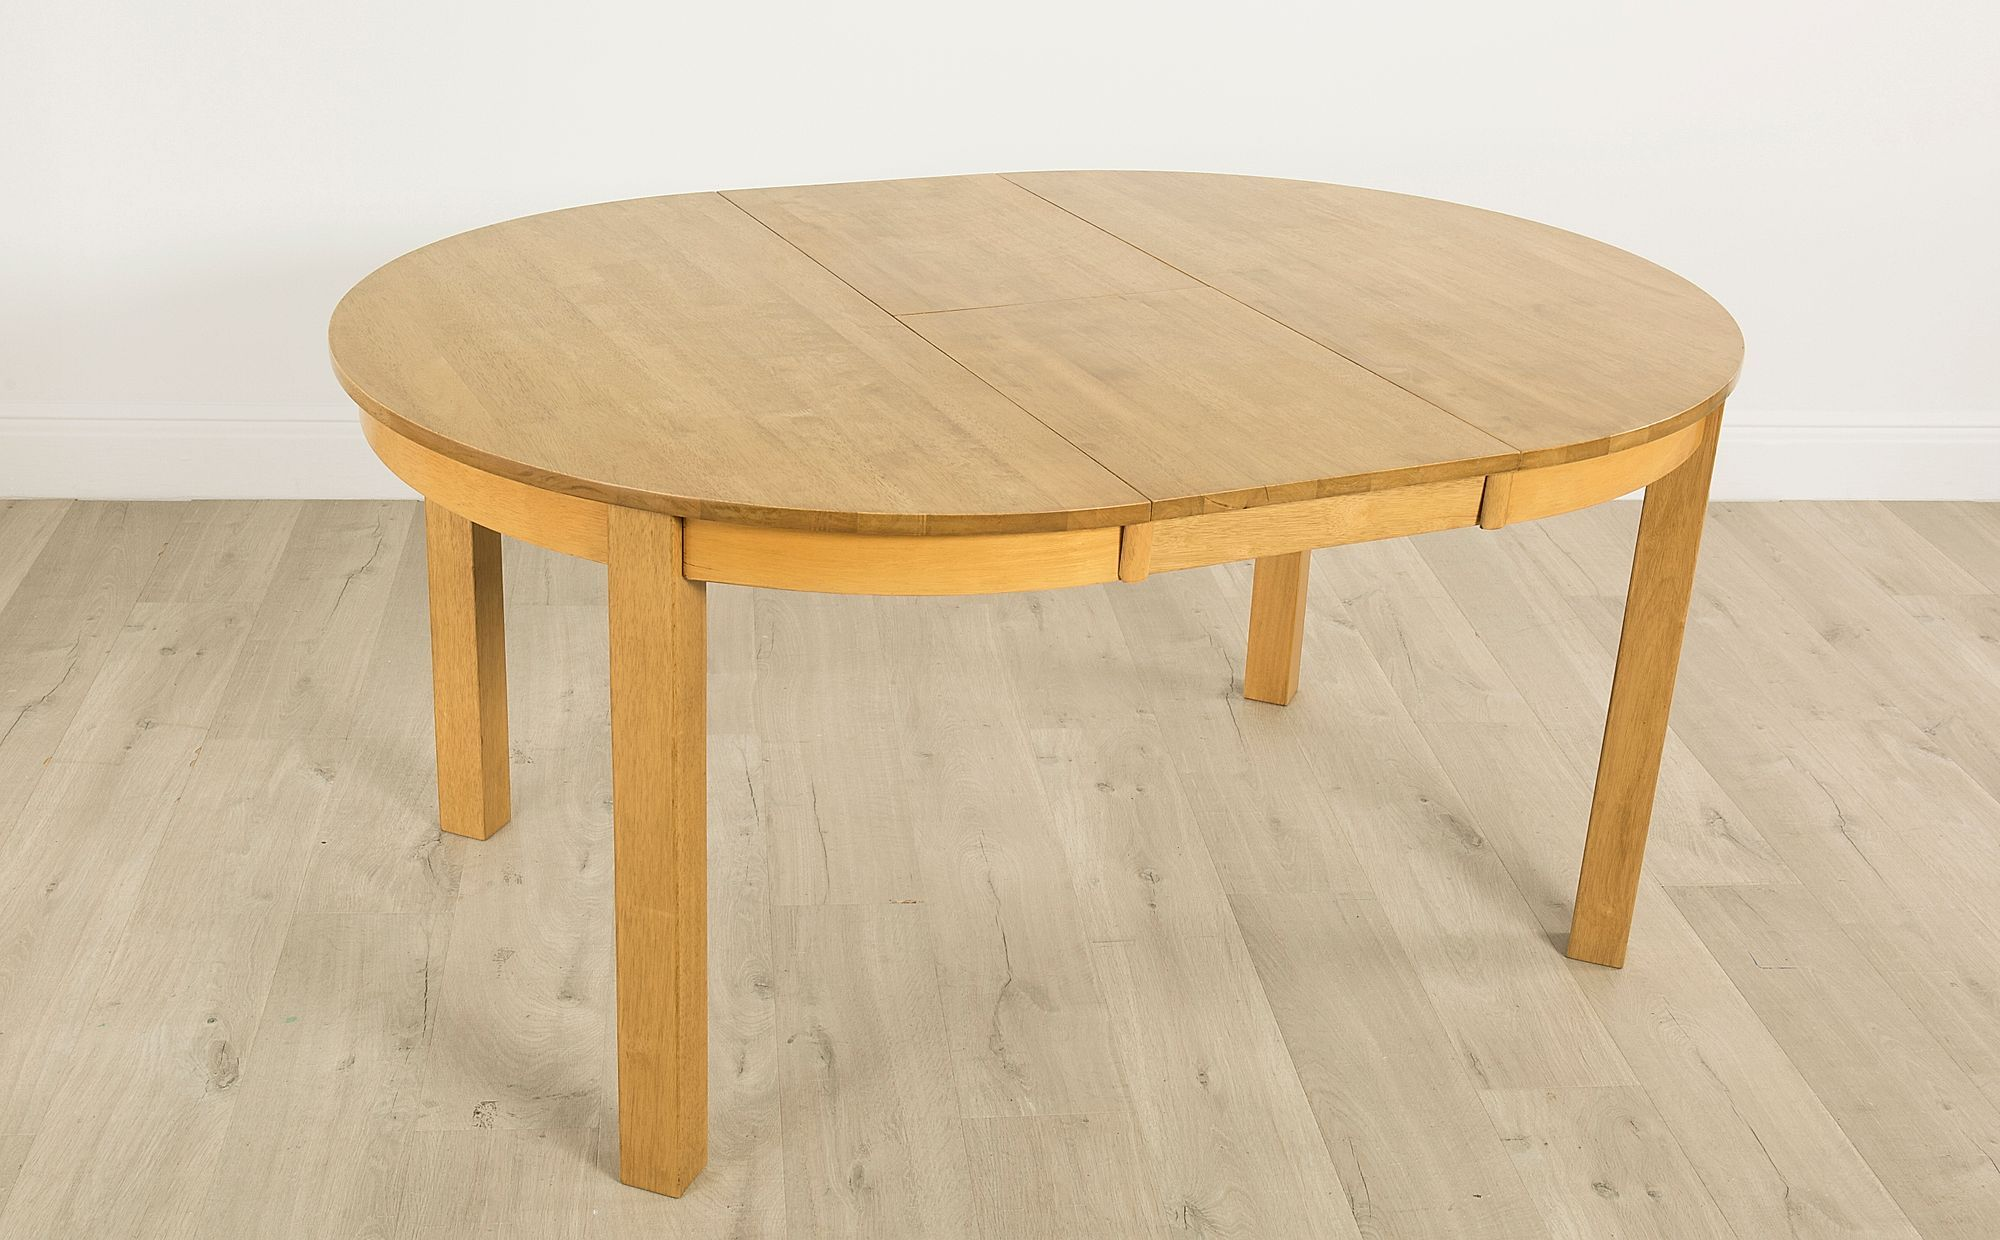 Marlborough Round Oak Extending Dining Table 120 160cm Oak